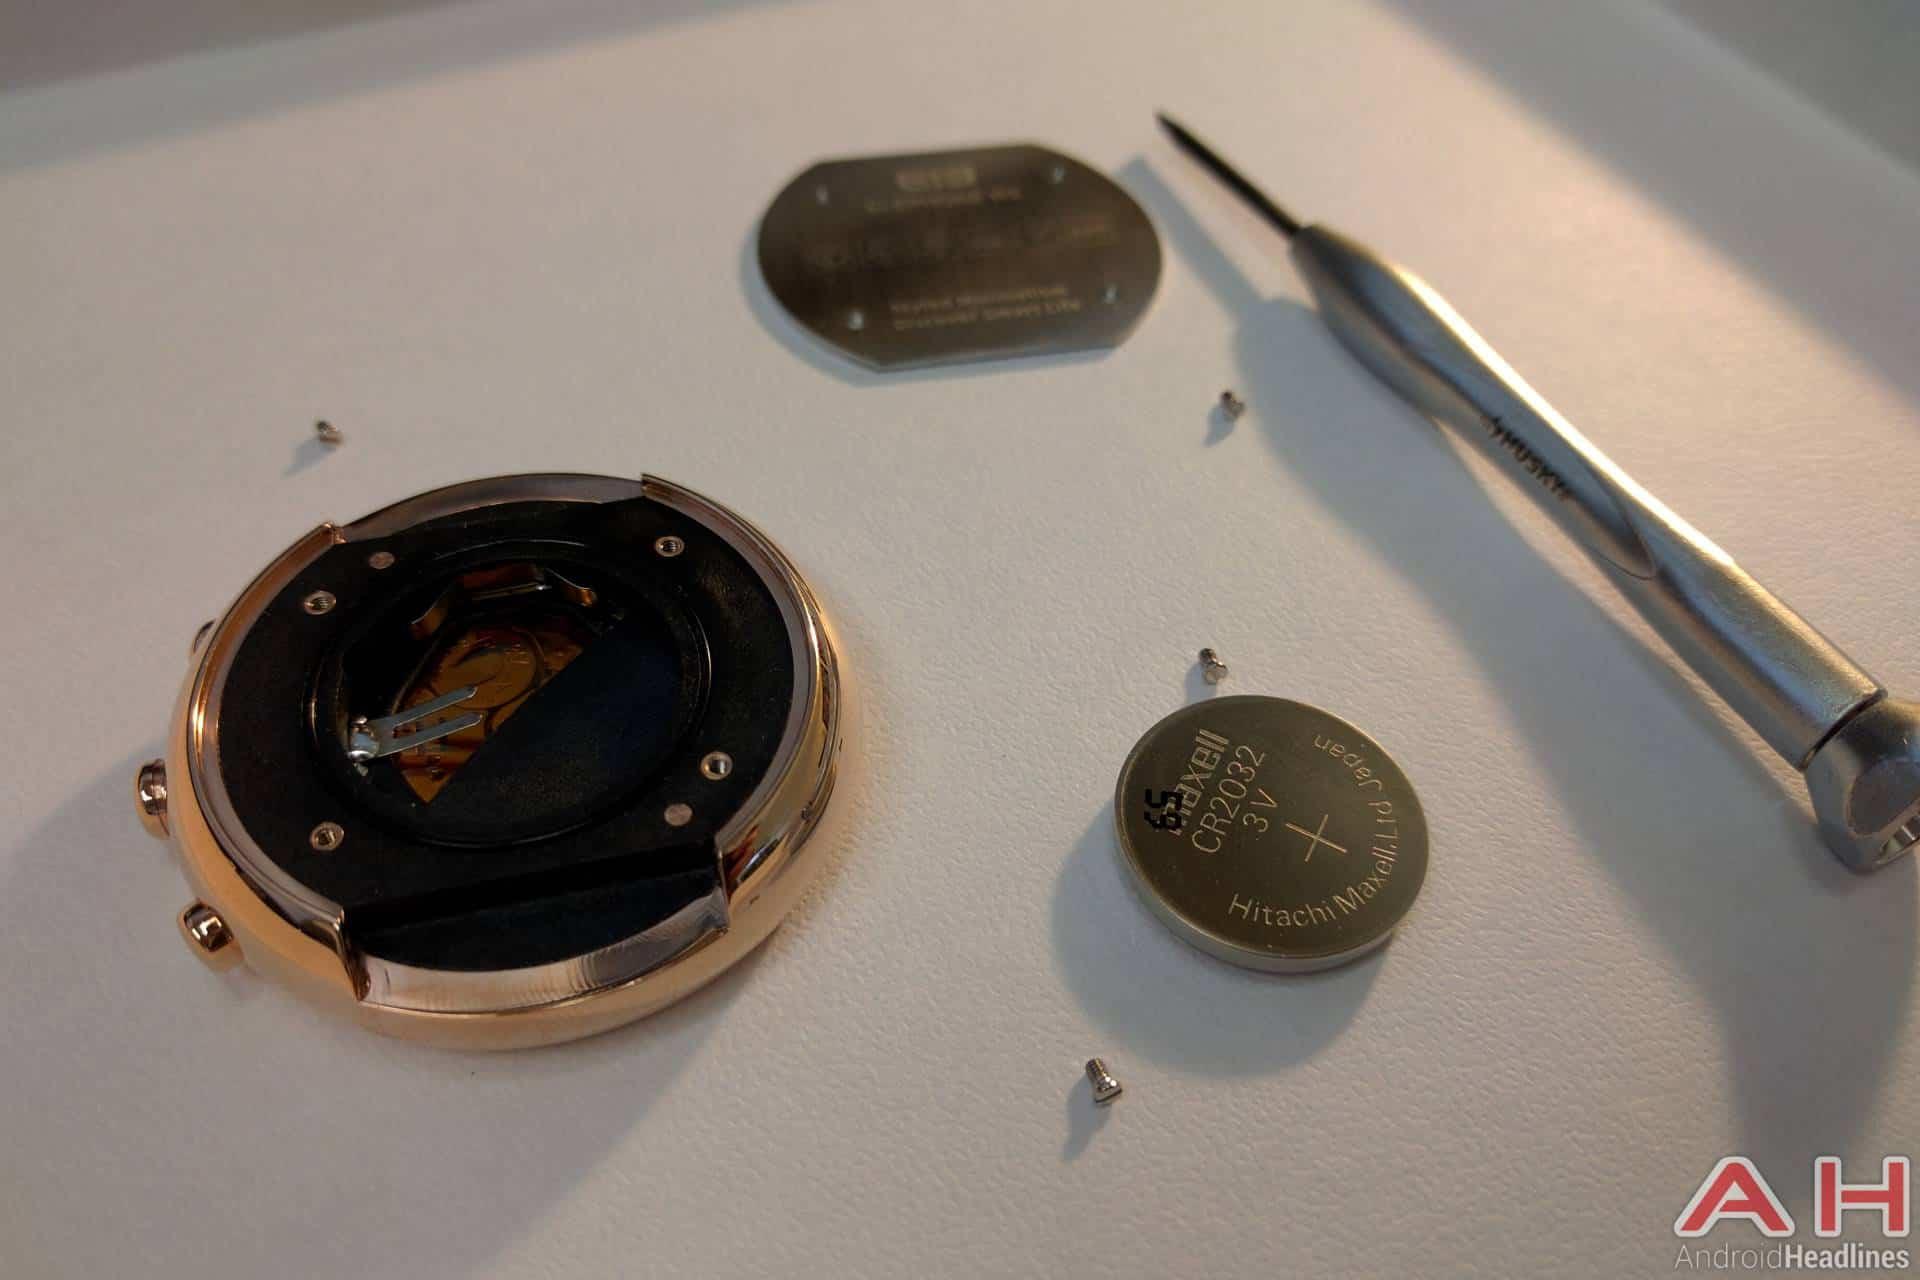 Elephone-W2-Watch-AH-NS-battery